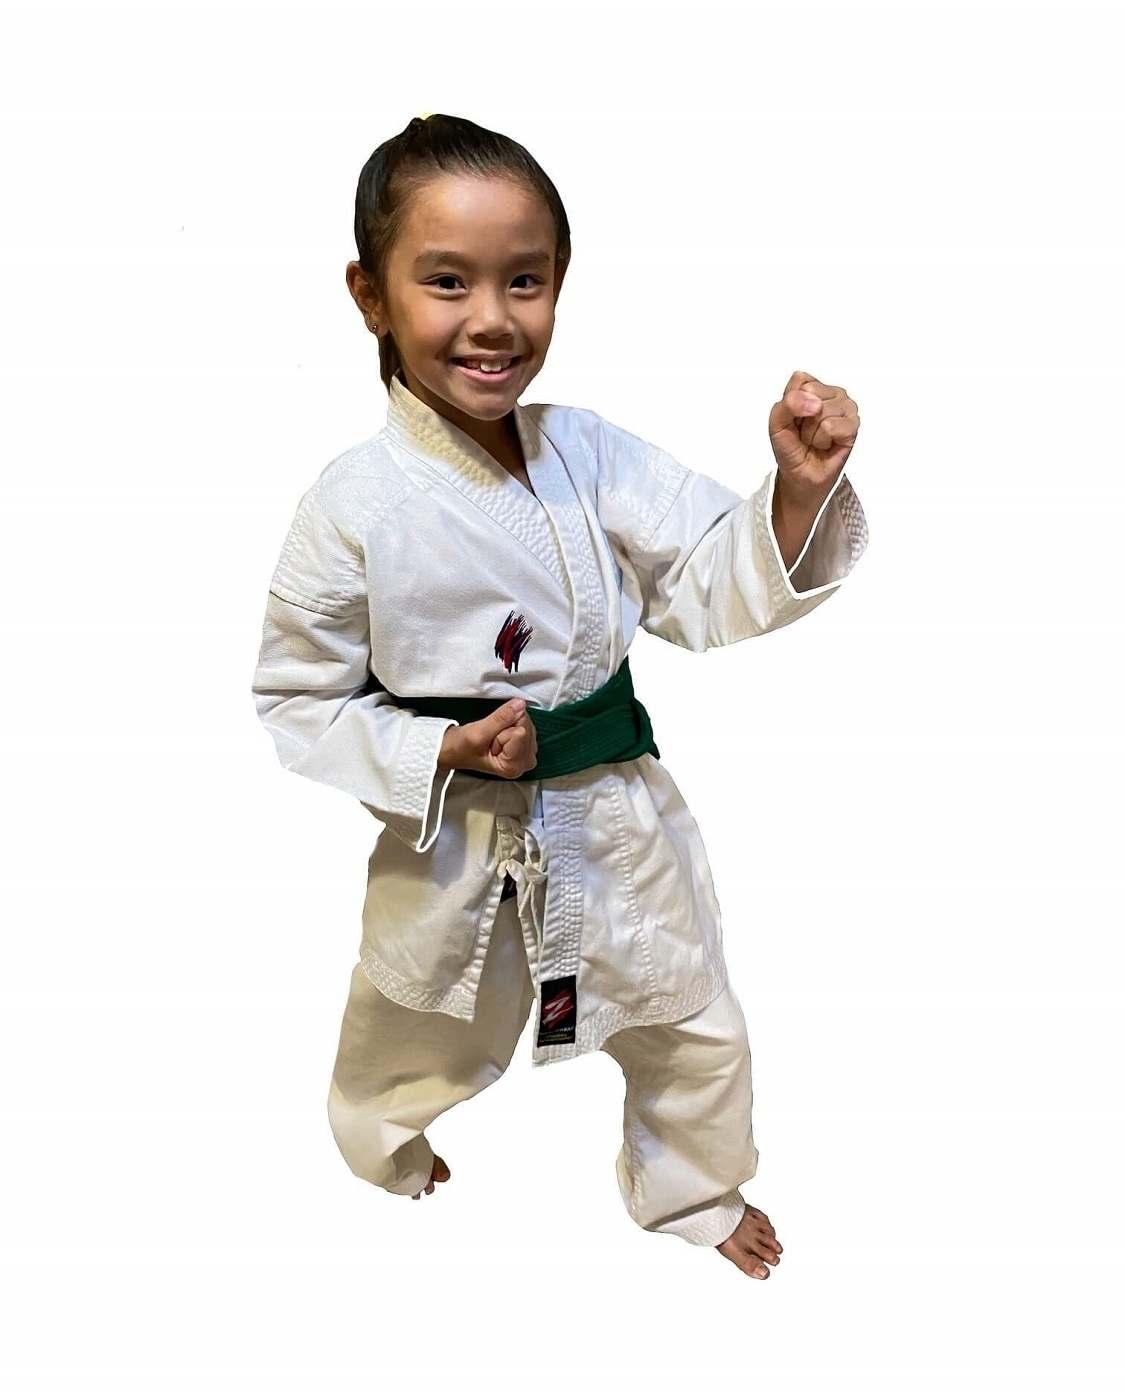 Webp.net Resizeimage, Destiny Martial Arts Academy